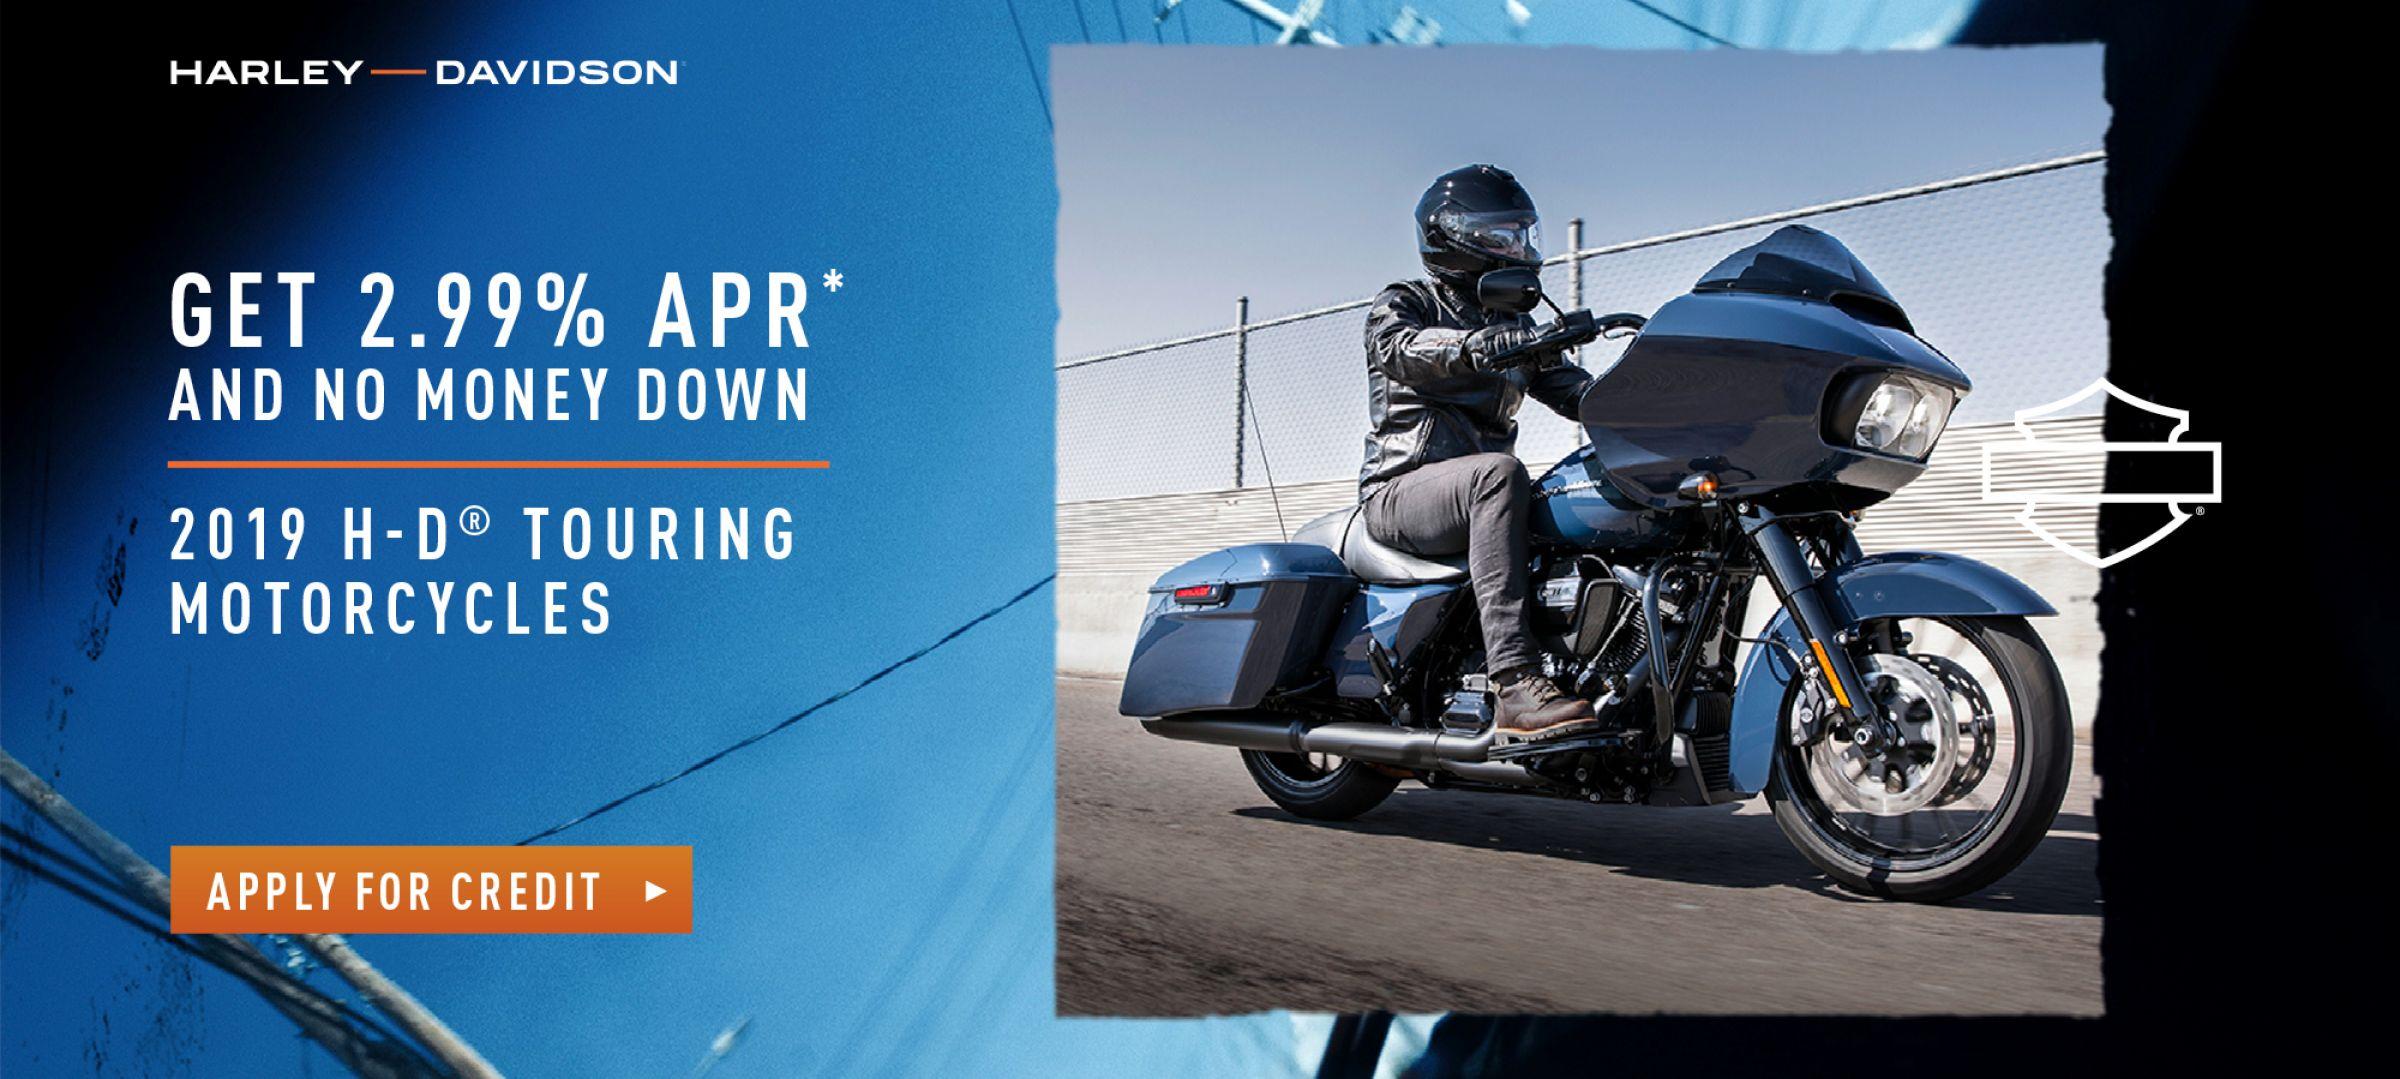 Harley Davidson Fatboy Merchandise Ebay Buyudum Cocuk Oldum